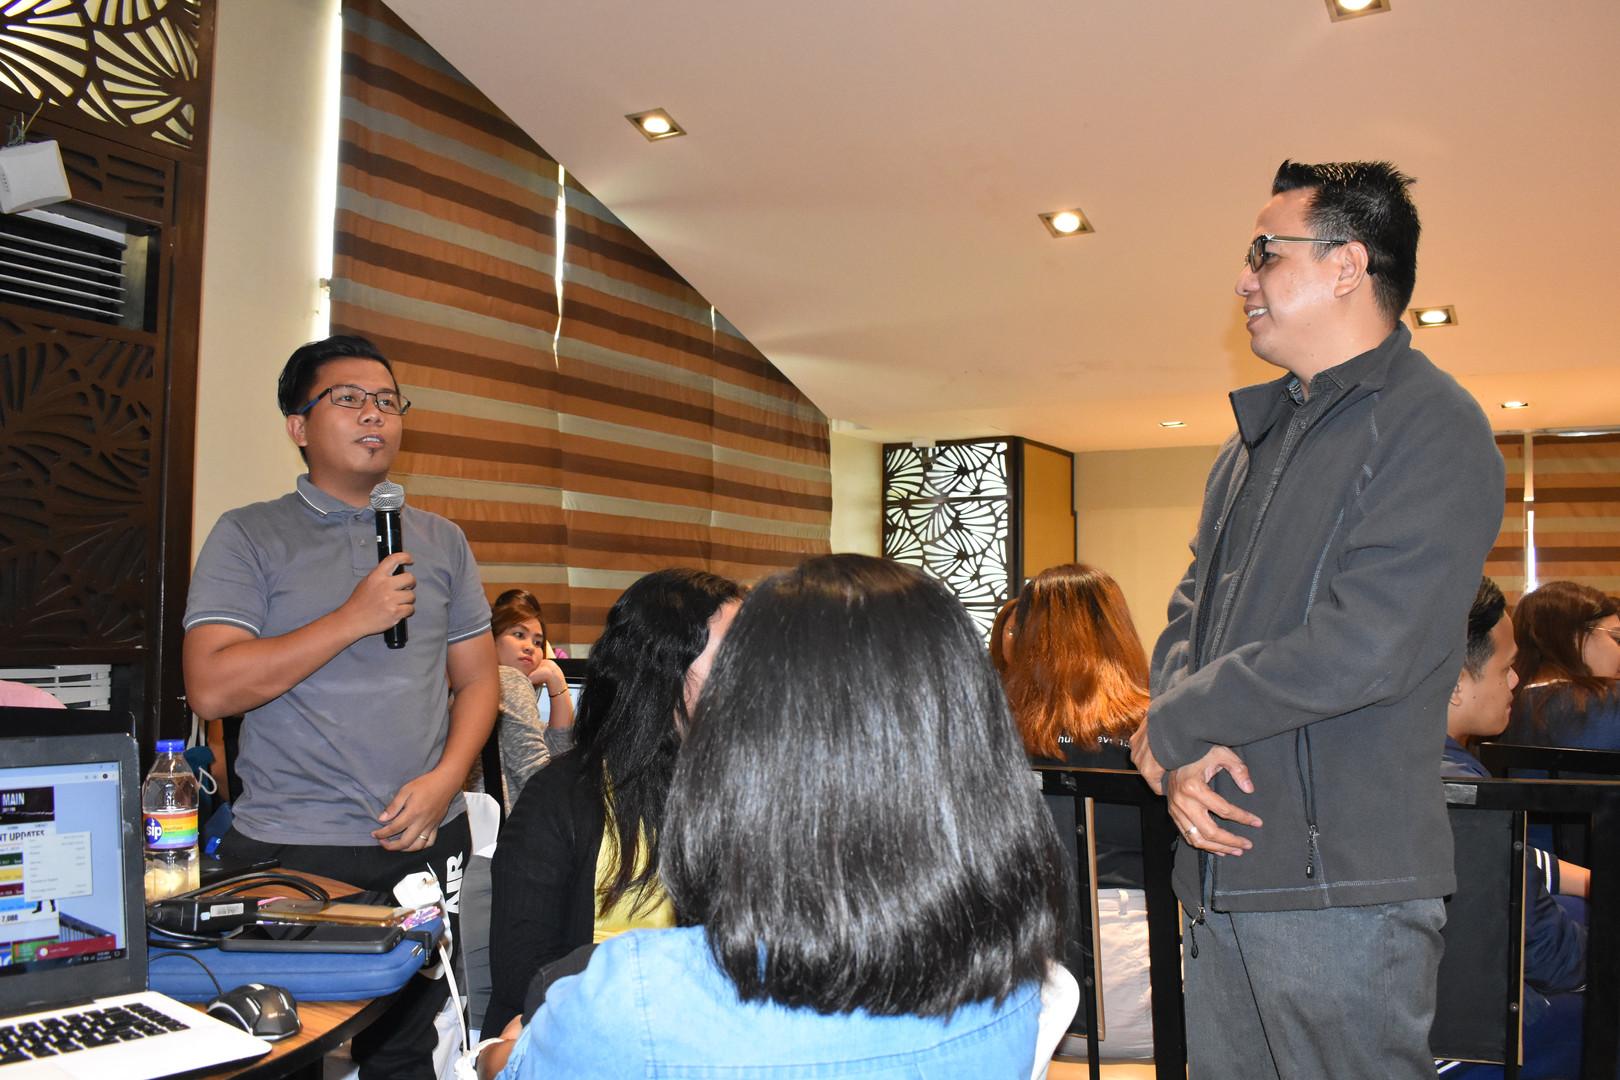 NEO LMS Sales Director Leandro Anonuevo and James Jaime